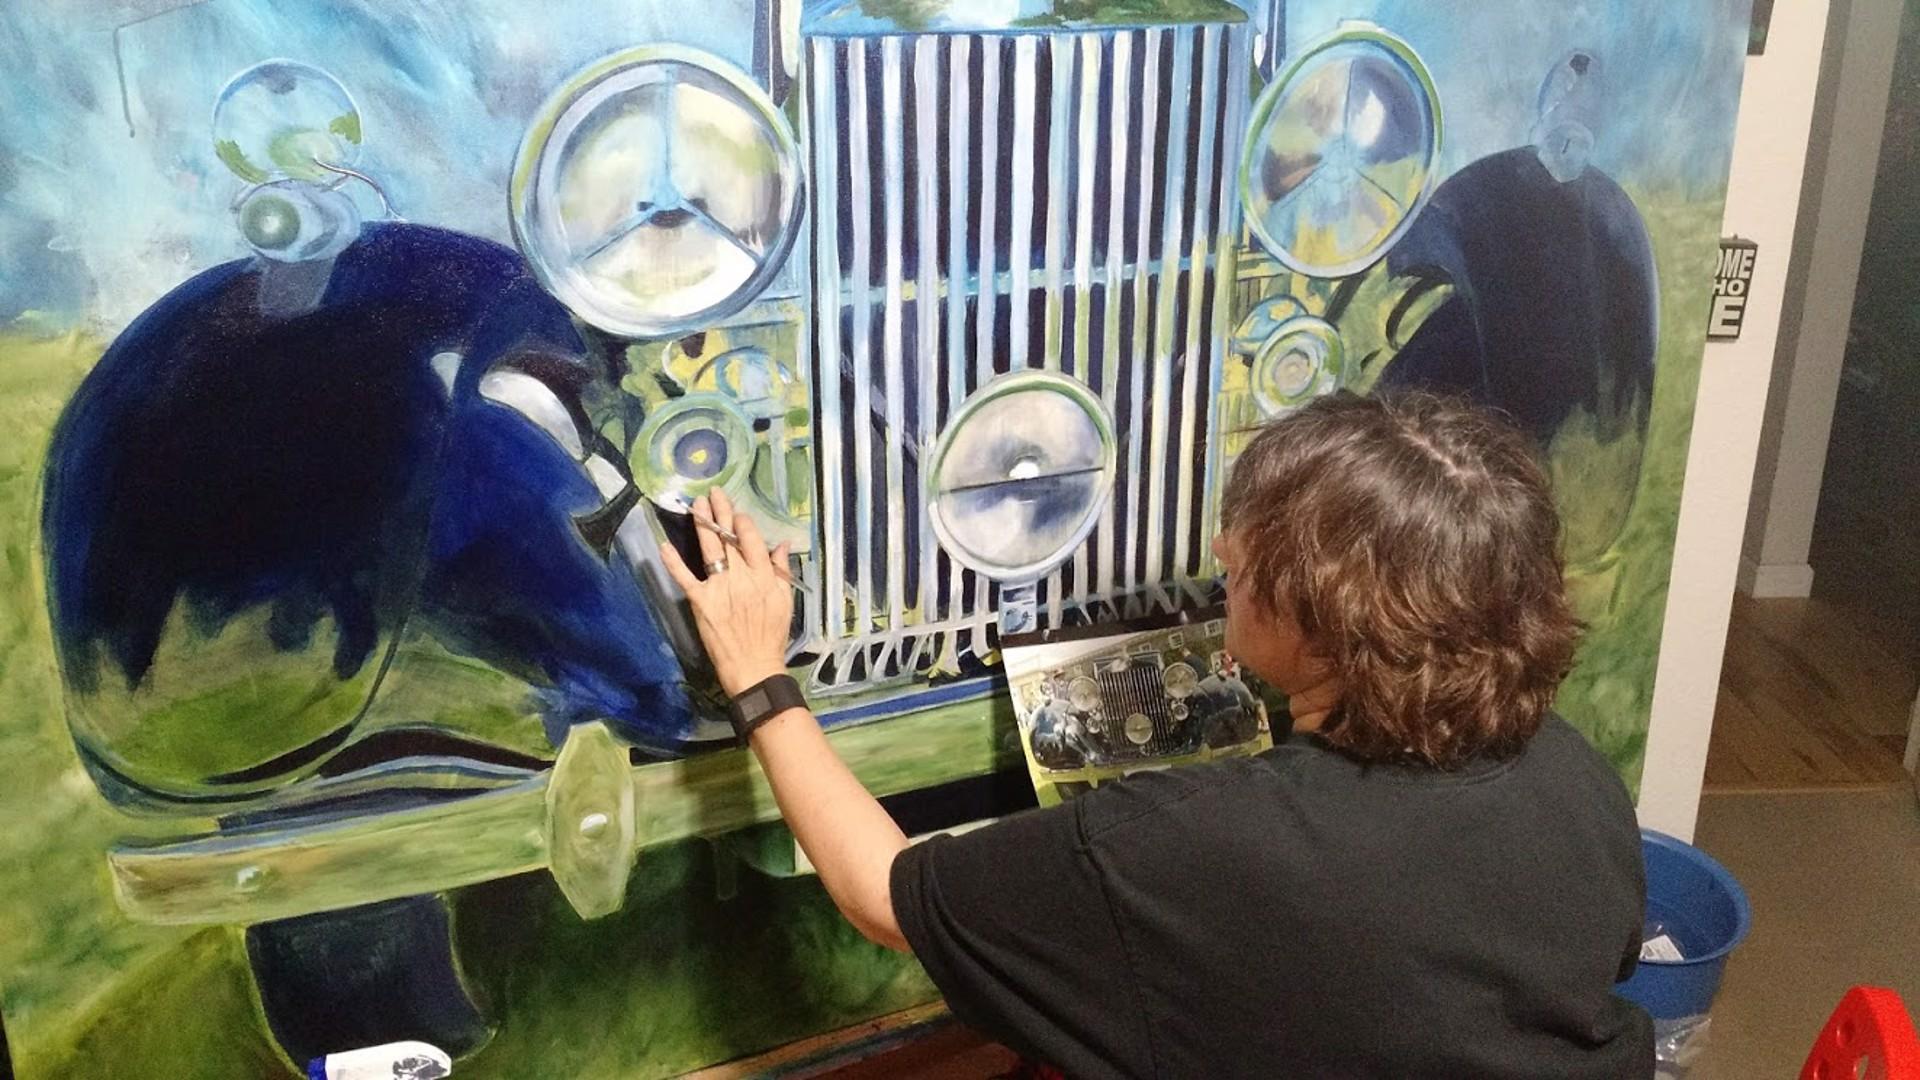 1937 Rolls Royce Phantom III Parkward Sedan cadeVille by Shan Fannin